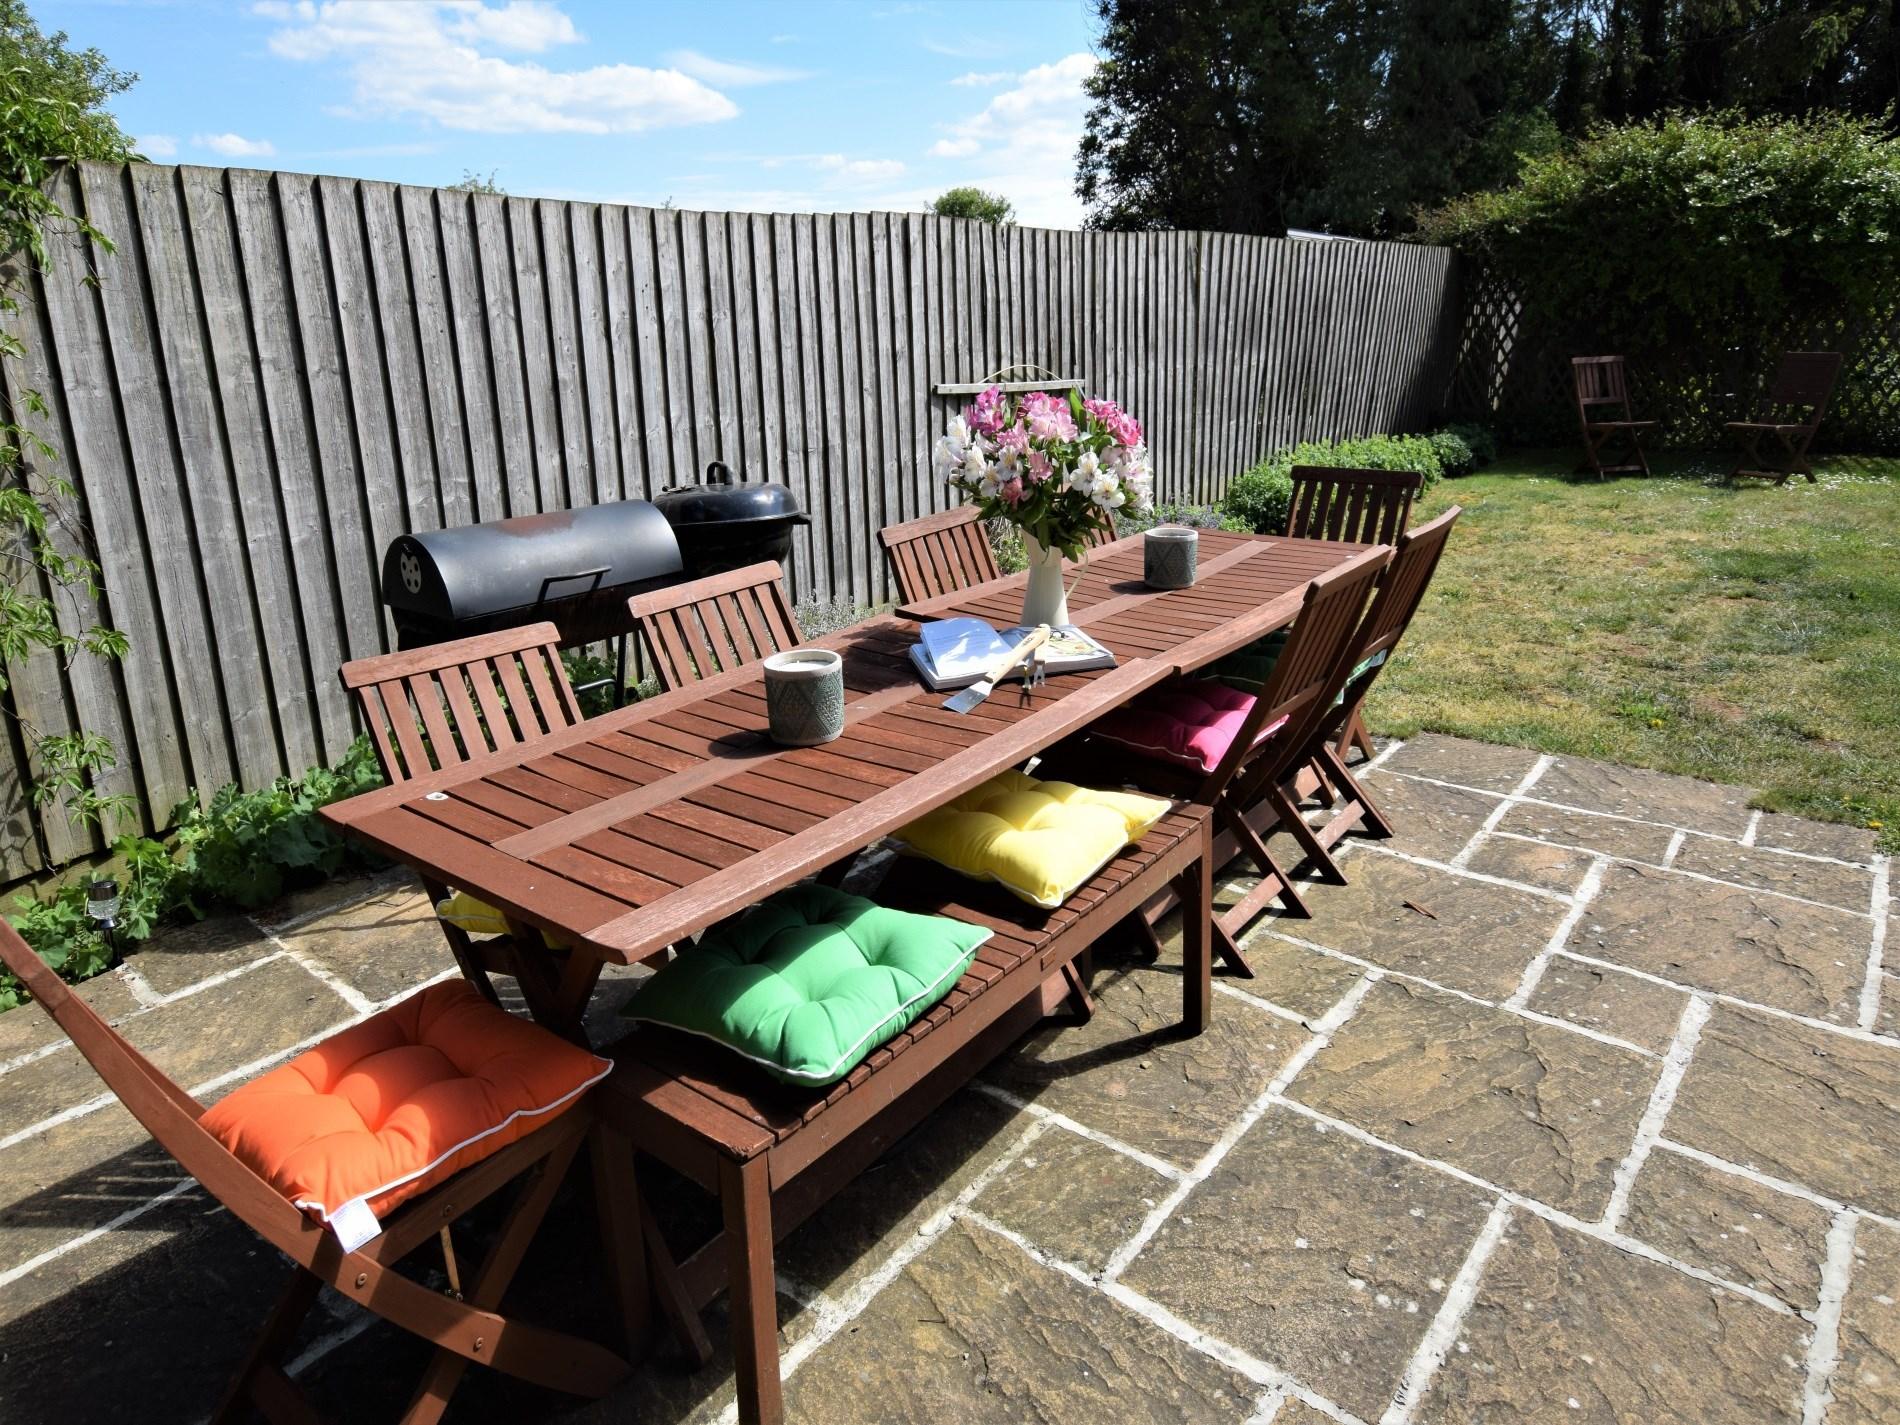 Enjoy a family BBQ in the garden